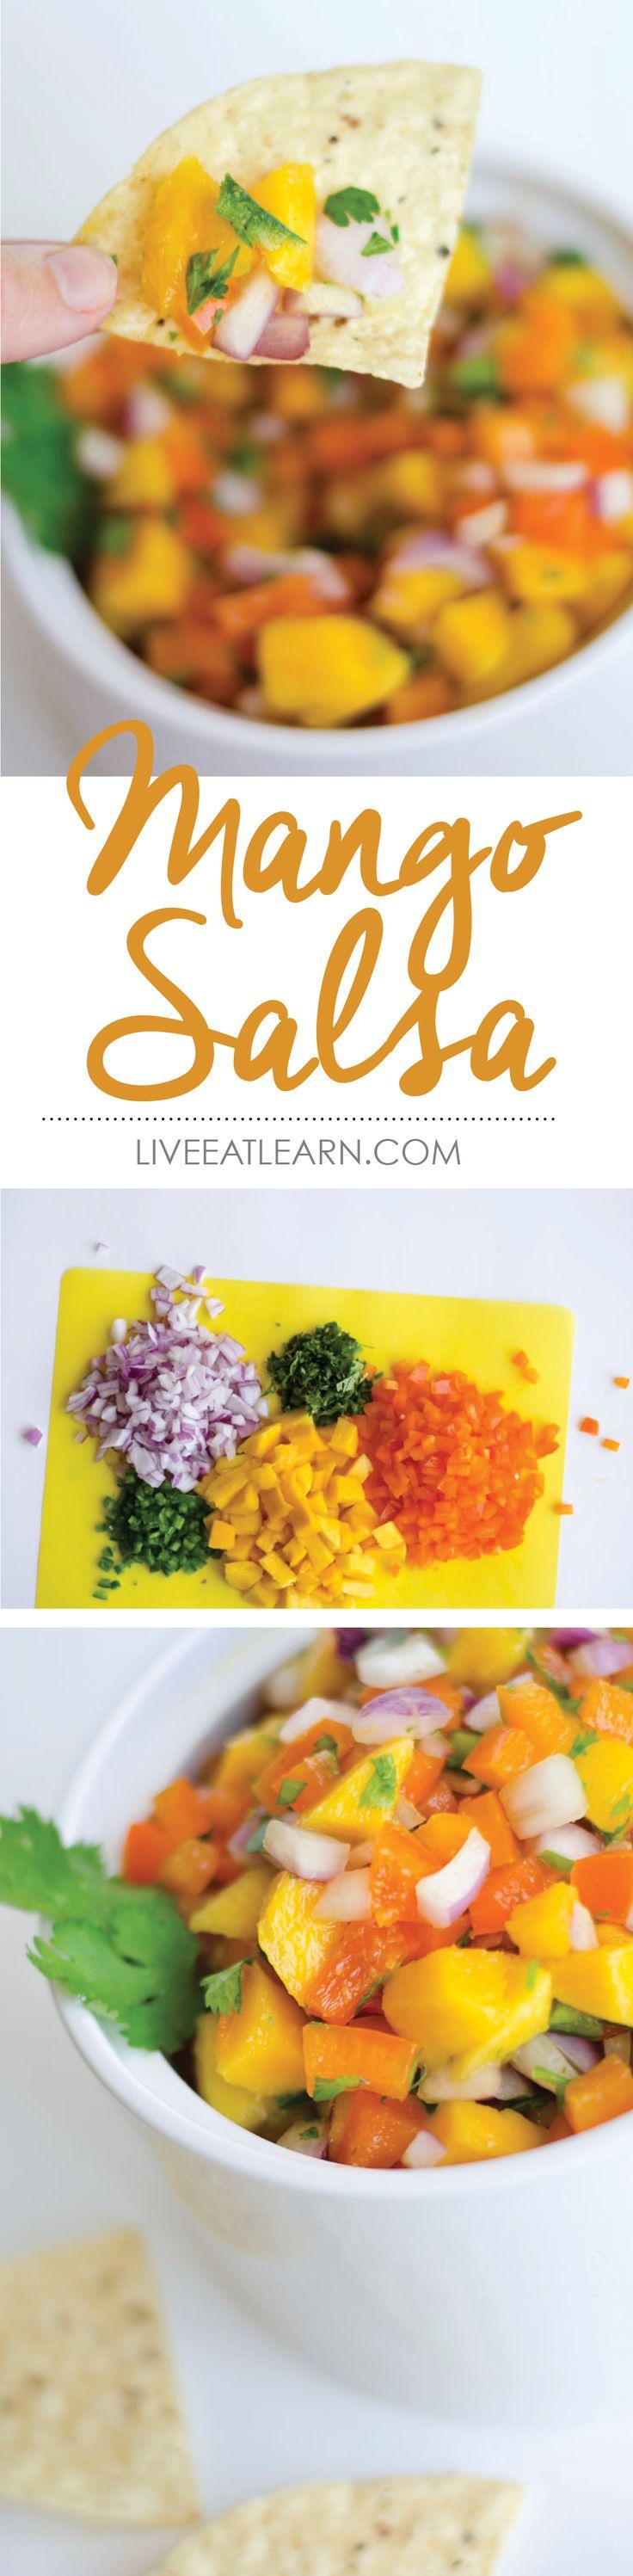 Mango salsa, so simple so summery // Live Eat Learn